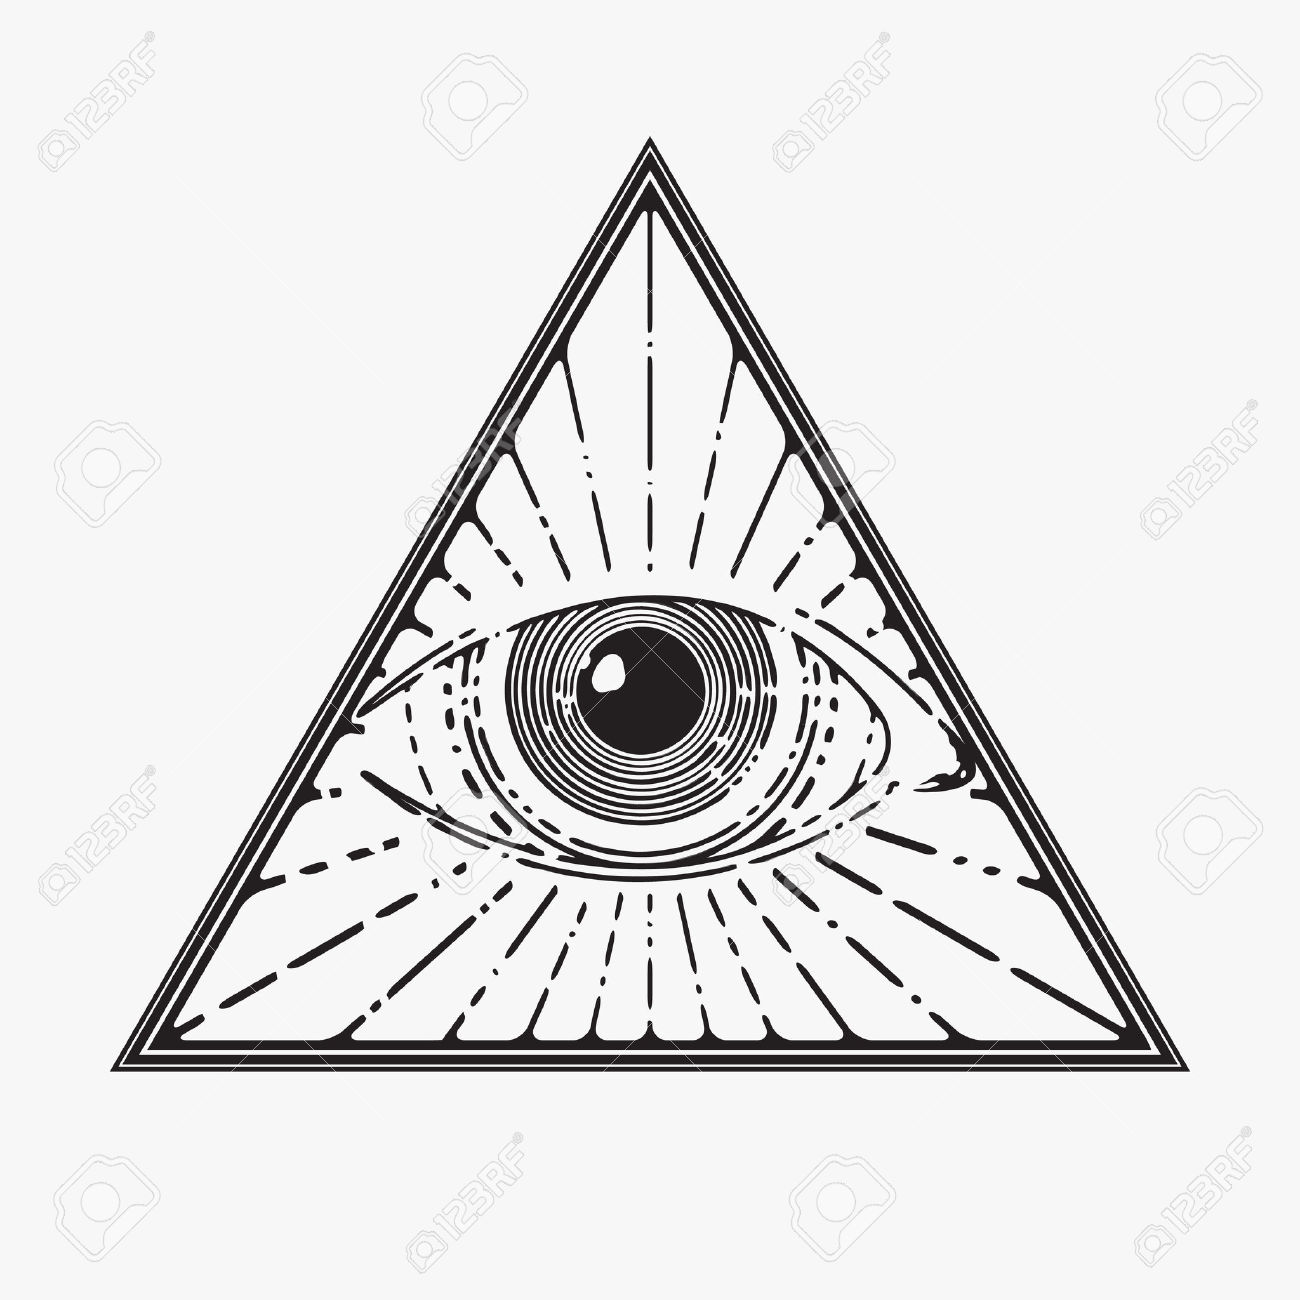 Illuminati clipart #15, Download drawings